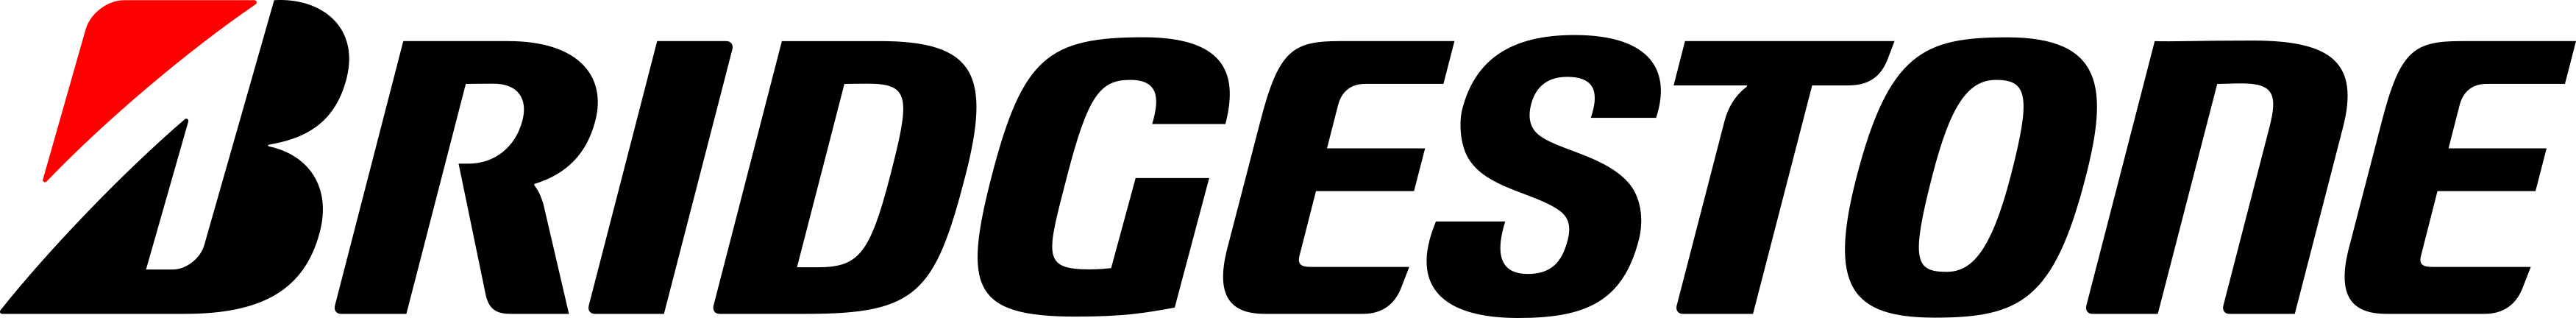 bridgestone logo logodownloadorg download de logotipos